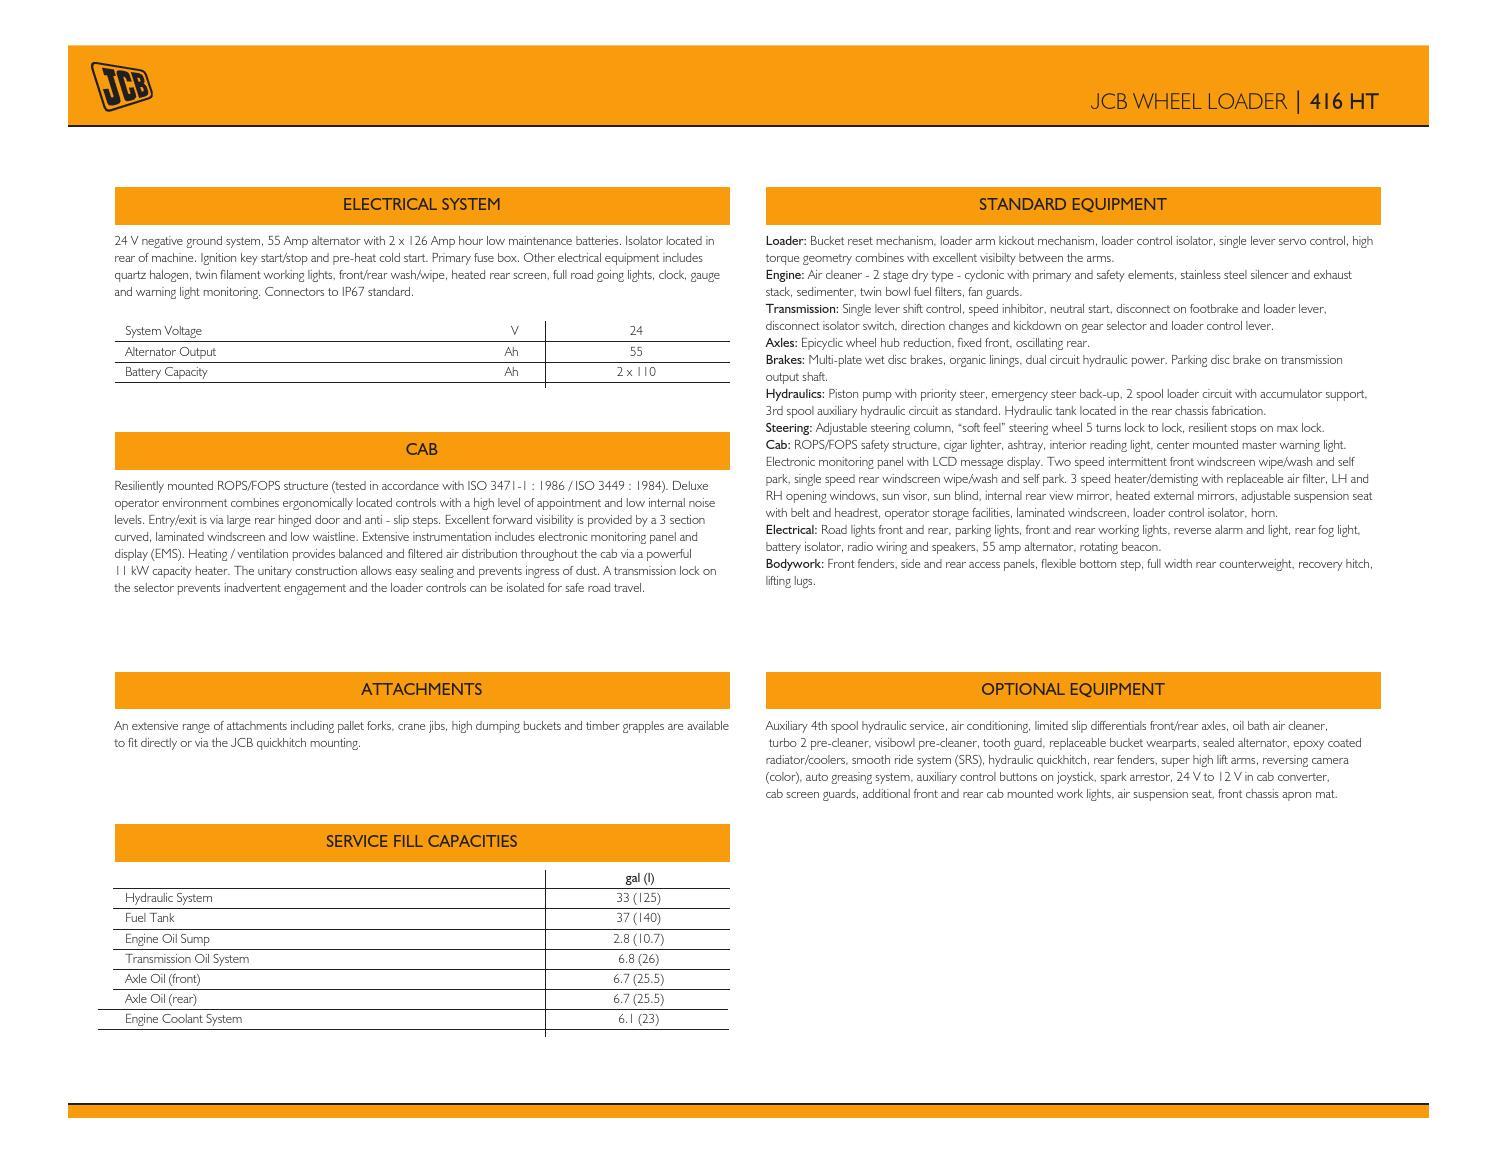 JCB 416 HT Spec Sheet US Mar 2013 by JCB North America issuu – Jcb Fuse Box Location